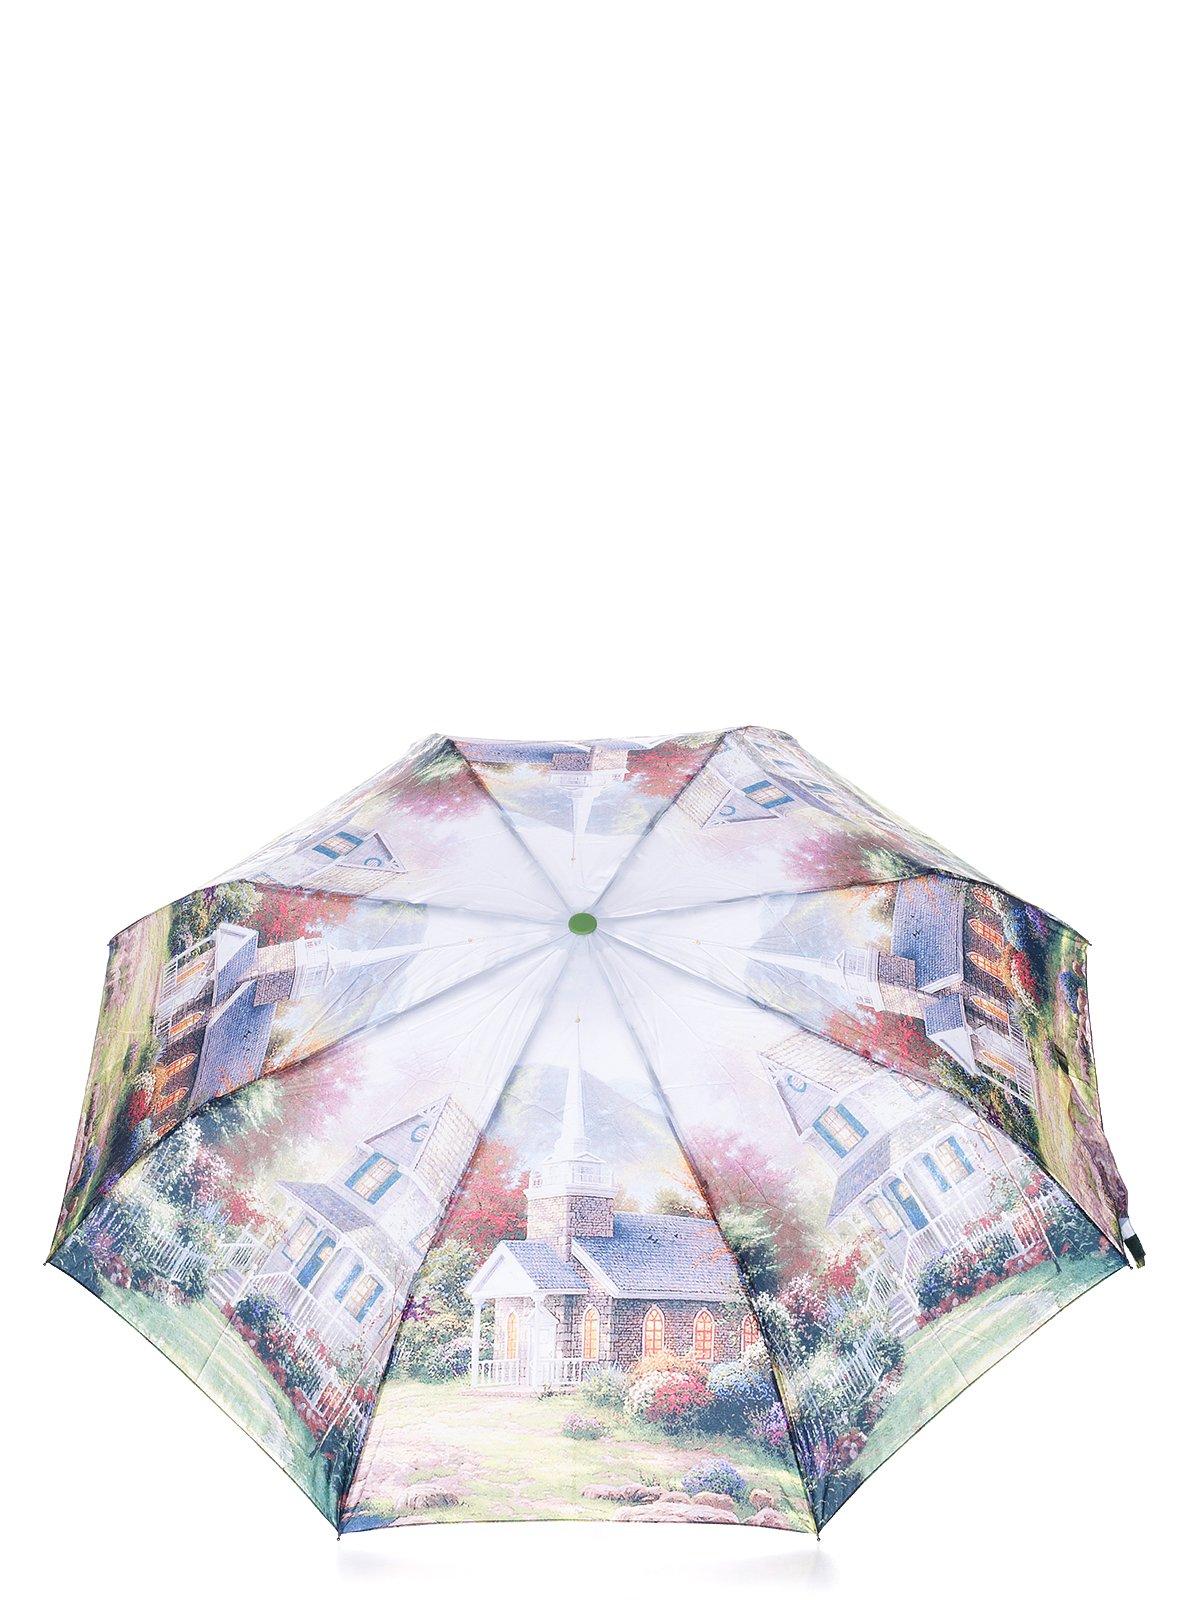 Зонт полу-автомат | 3754585